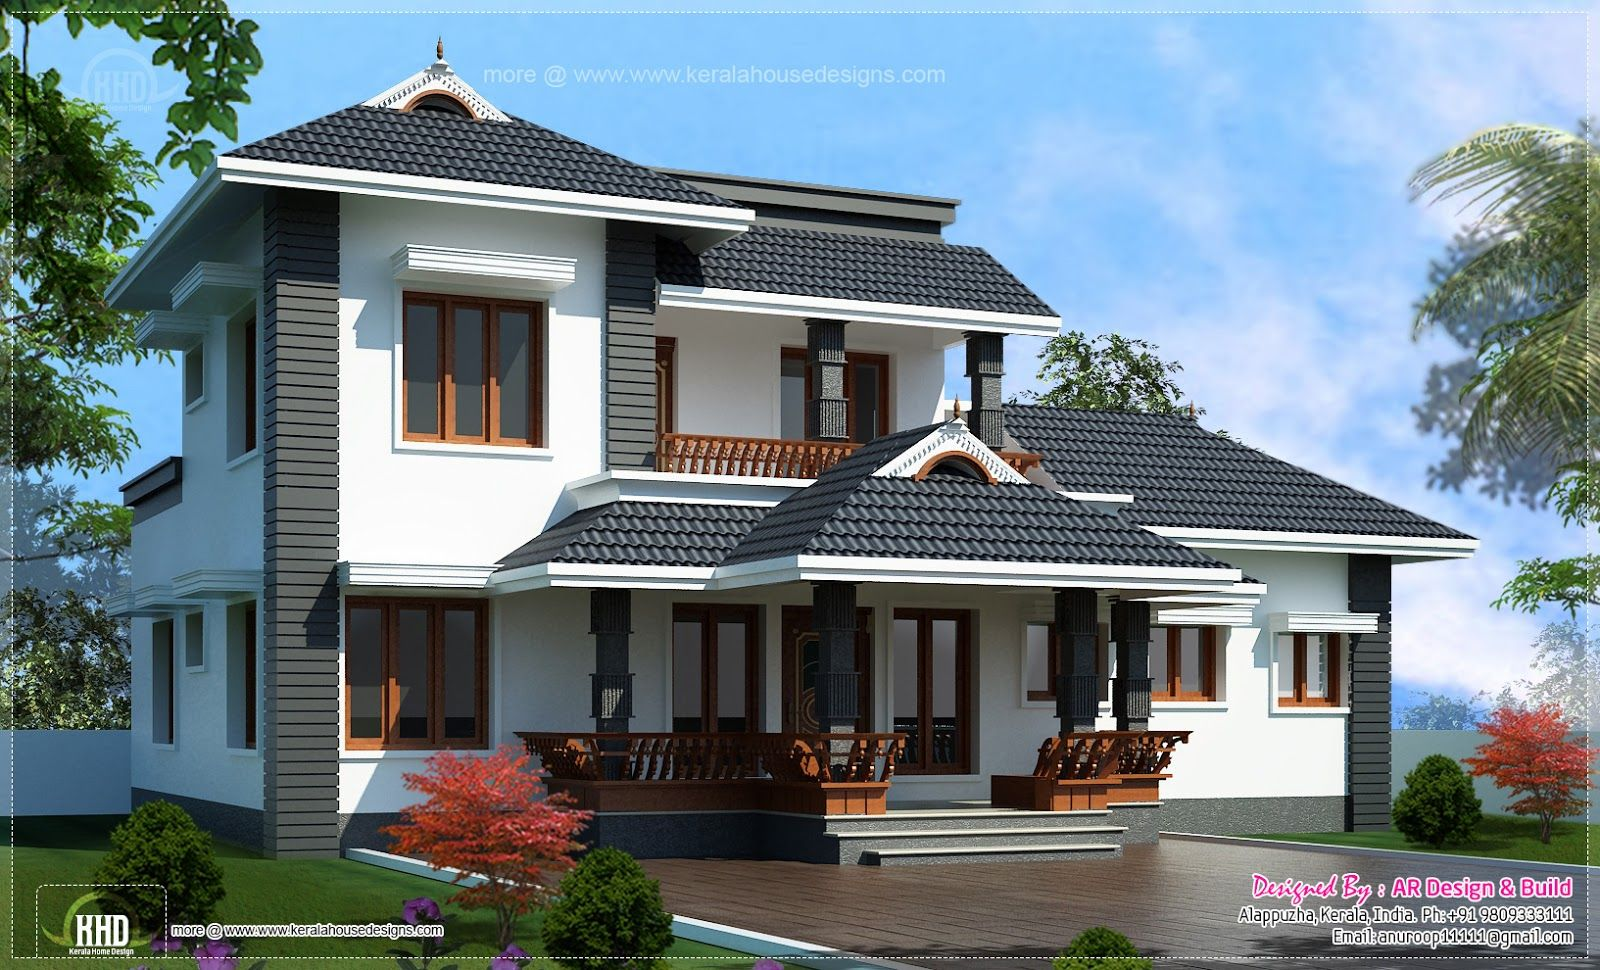 2000 sq.feet 4 bedroom sloping roof residence in 2020 ...